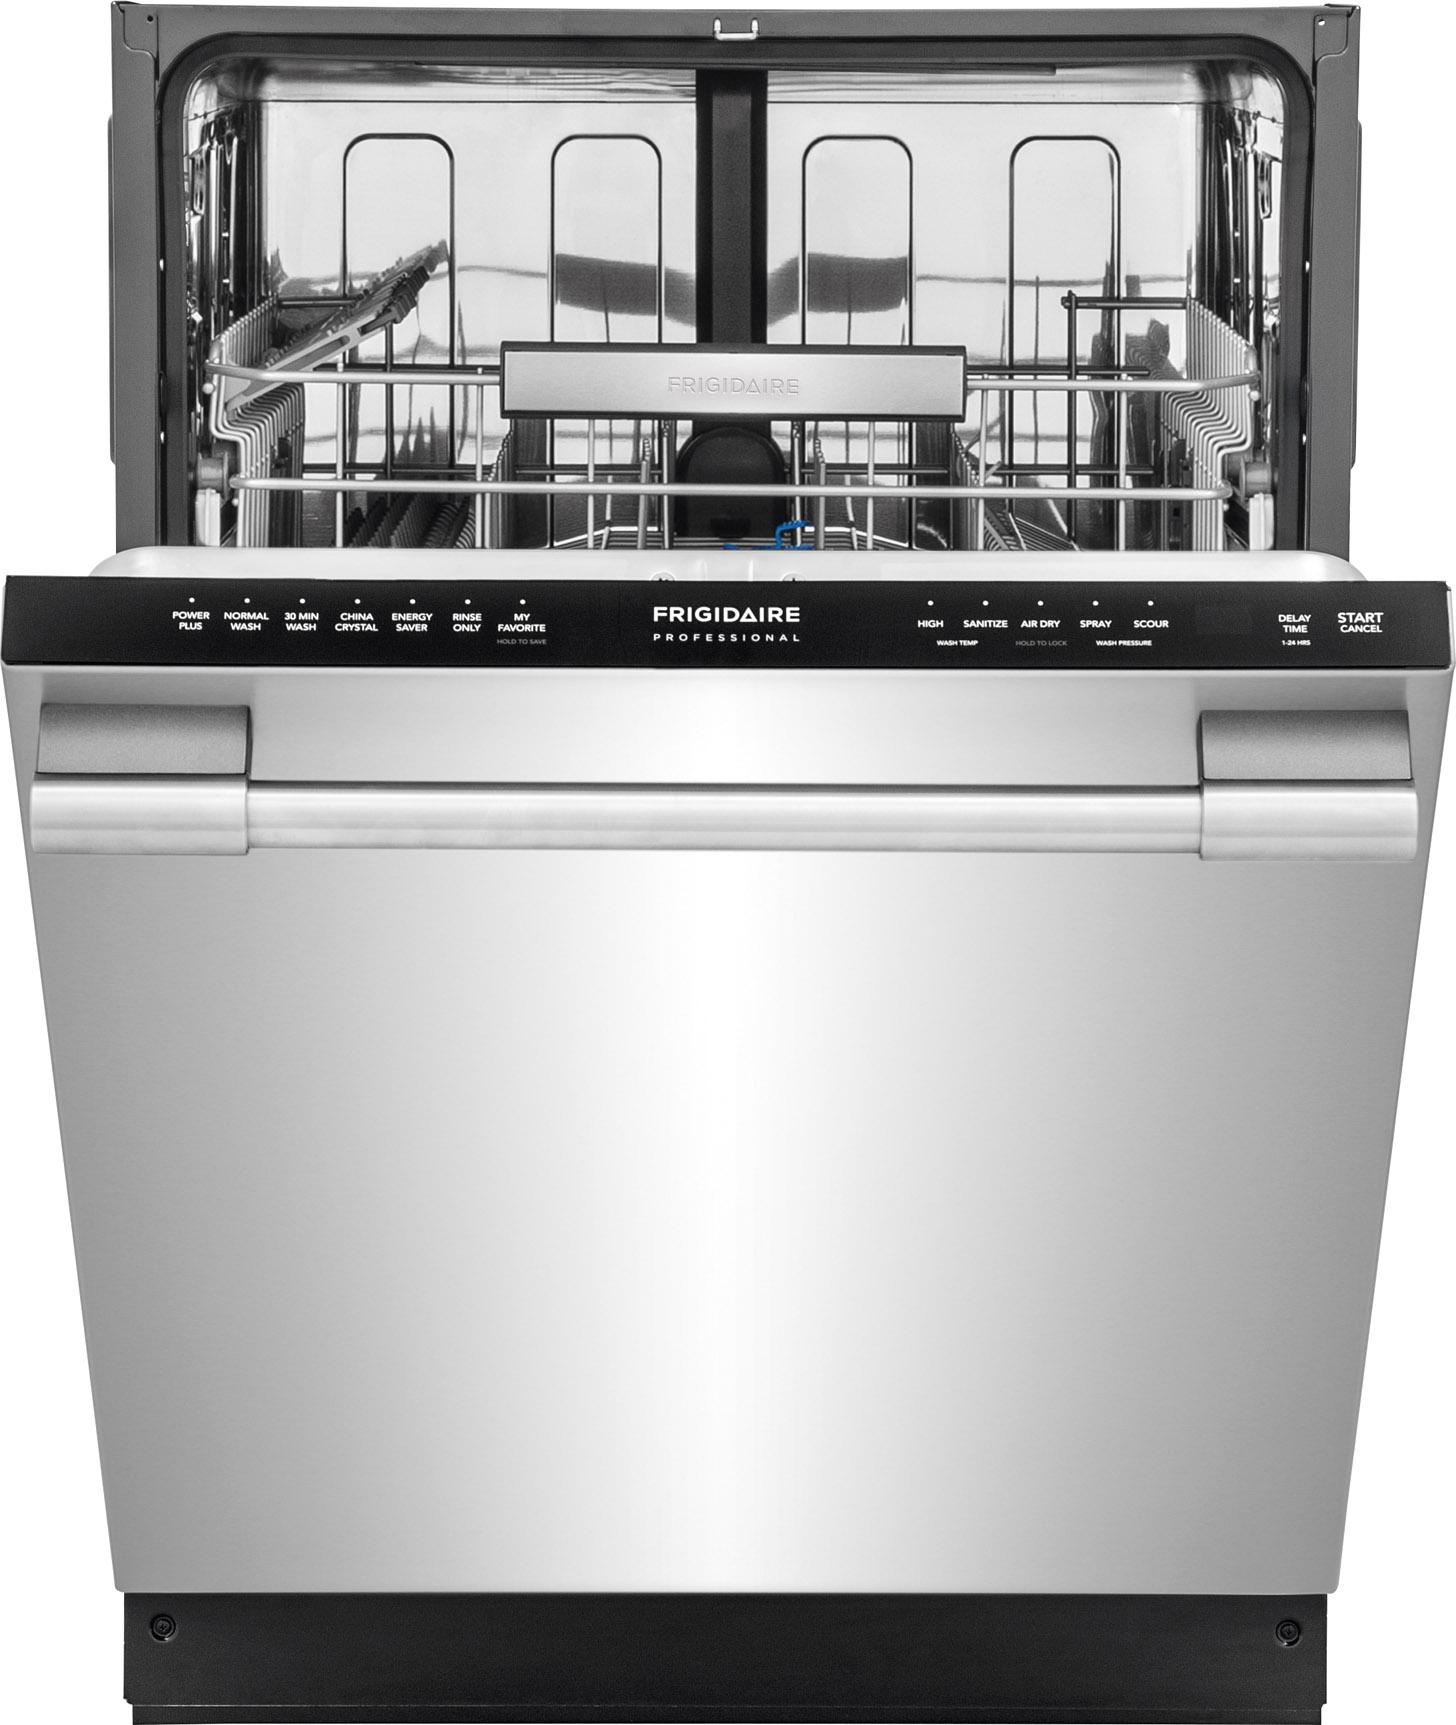 frigidaire kitchen appliances remodel budget estimator with newest suite of professional